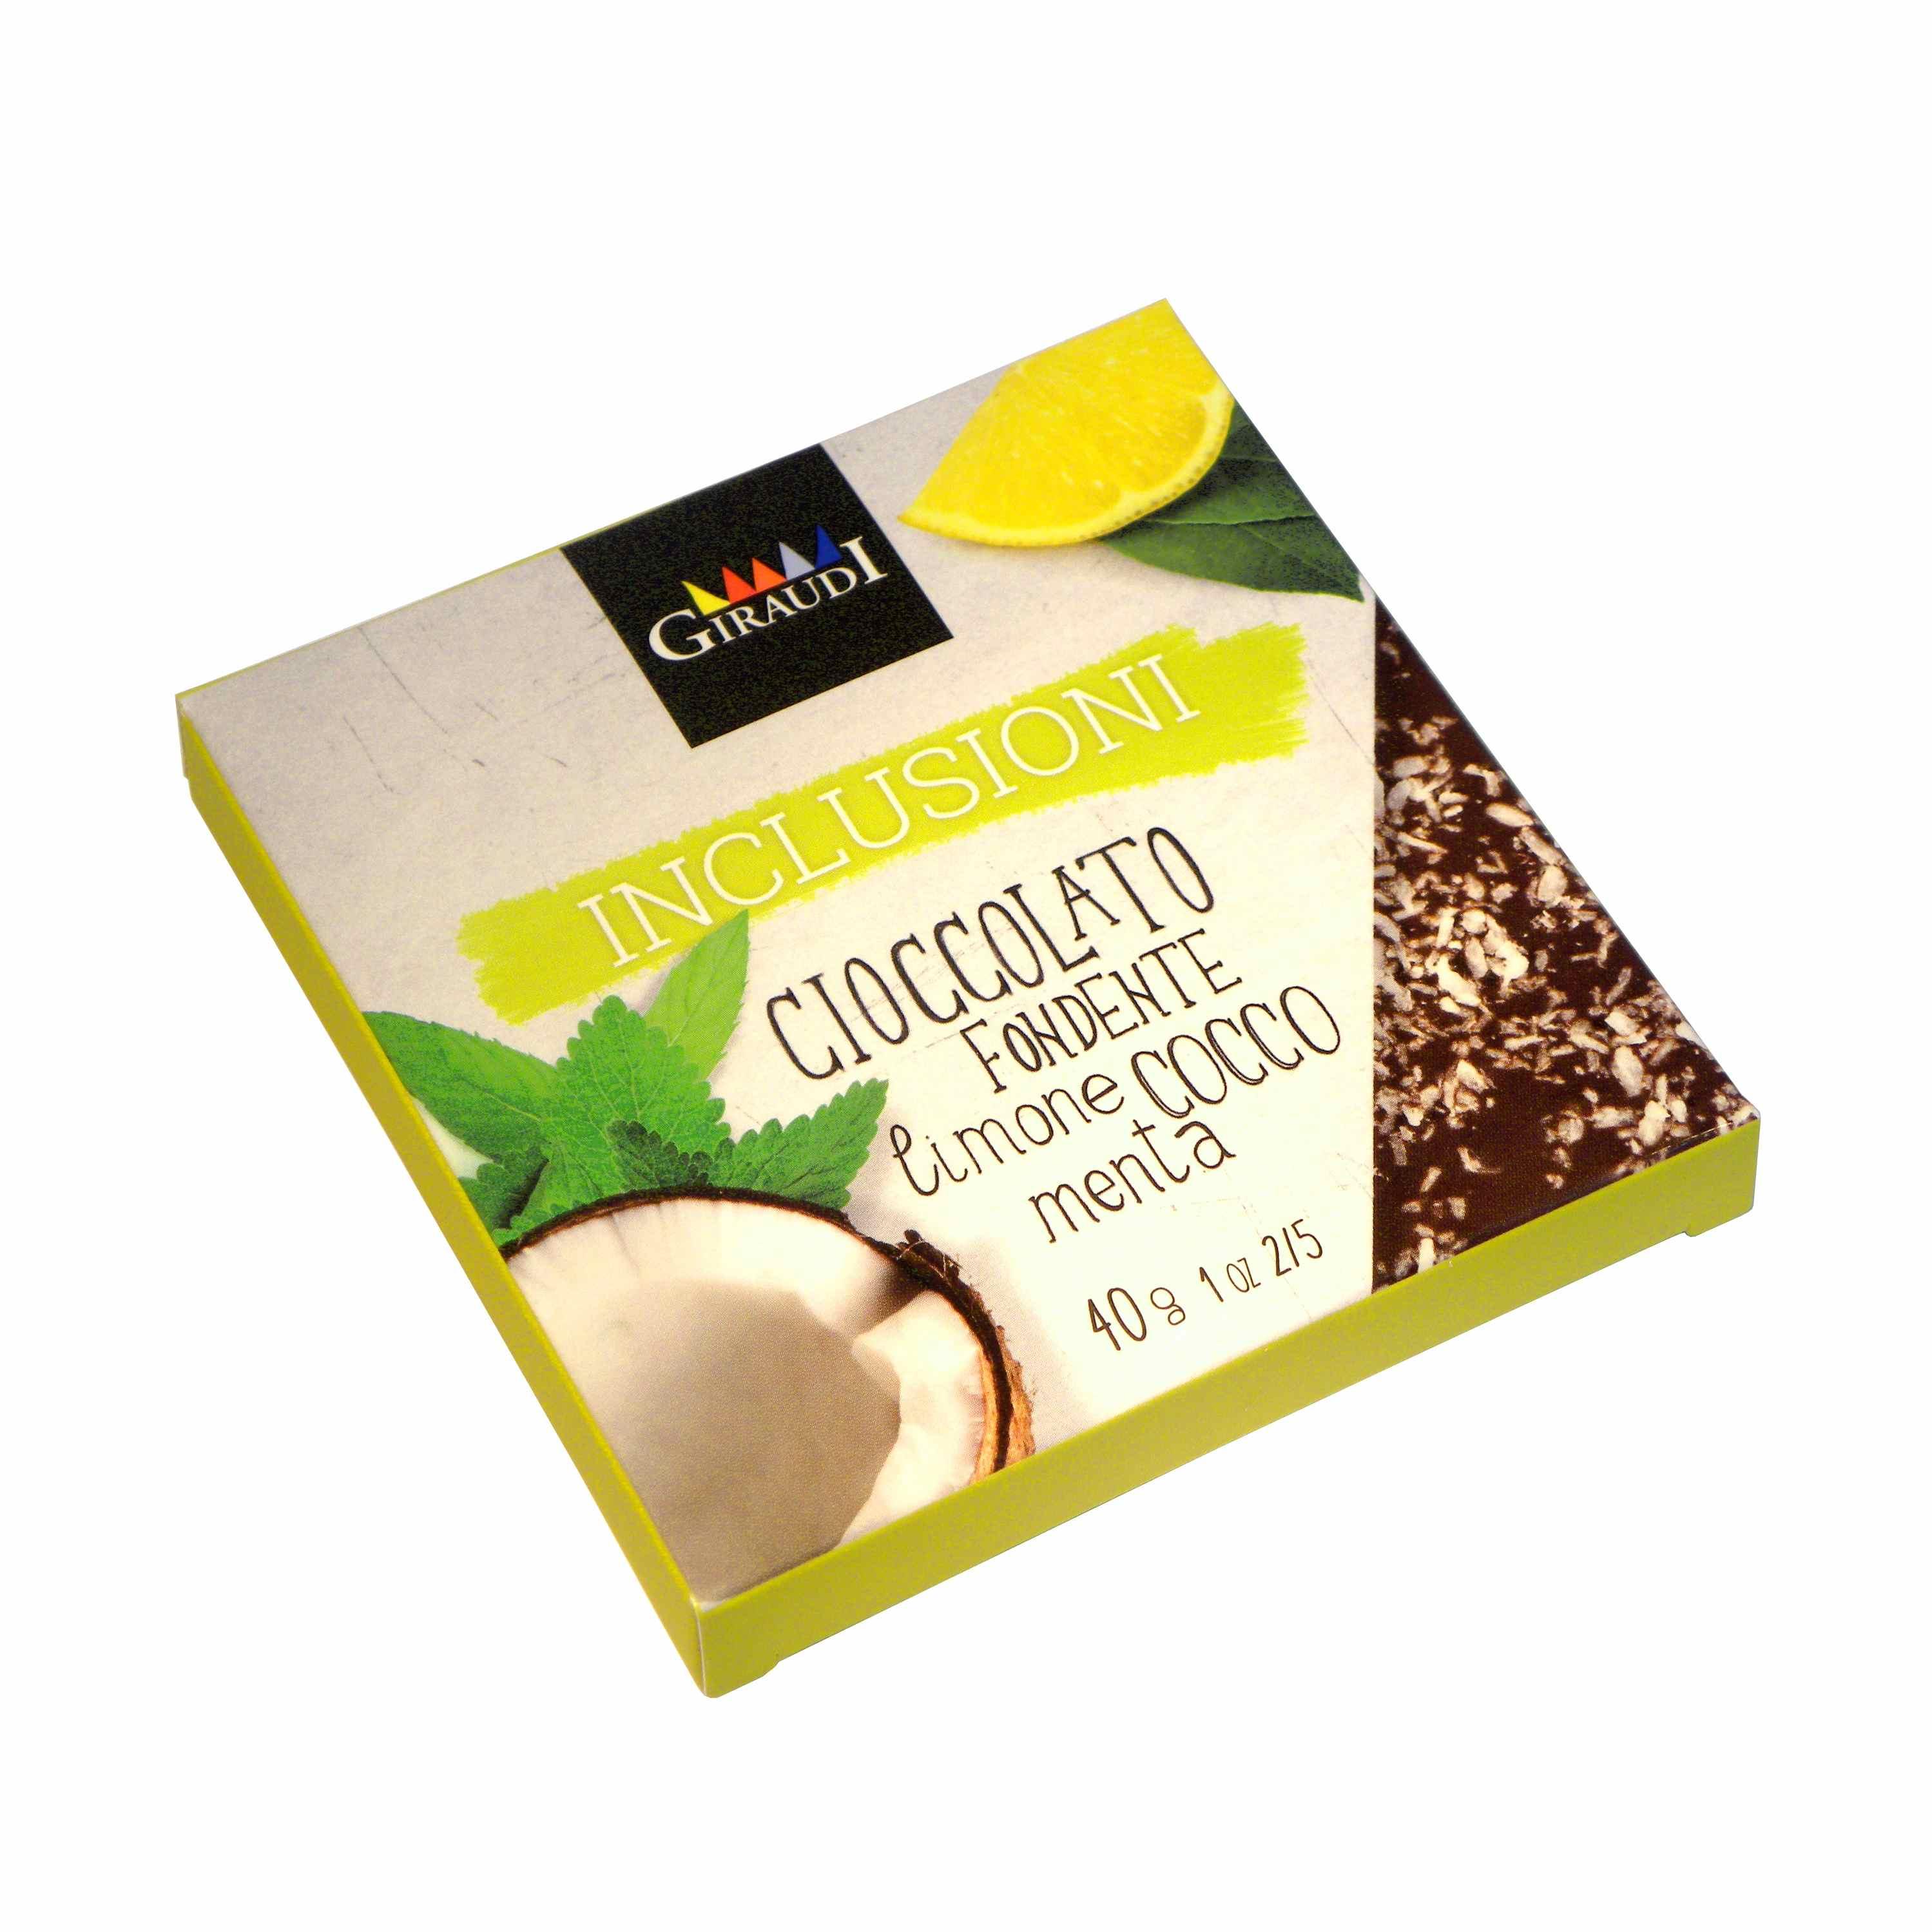 Giraudi tavoletta inclusioni limone cocco menta – Giraudi chocolate bar Dark Chocolate Lemon Coconut Mint  – Gustorotondo – Italian food boutique